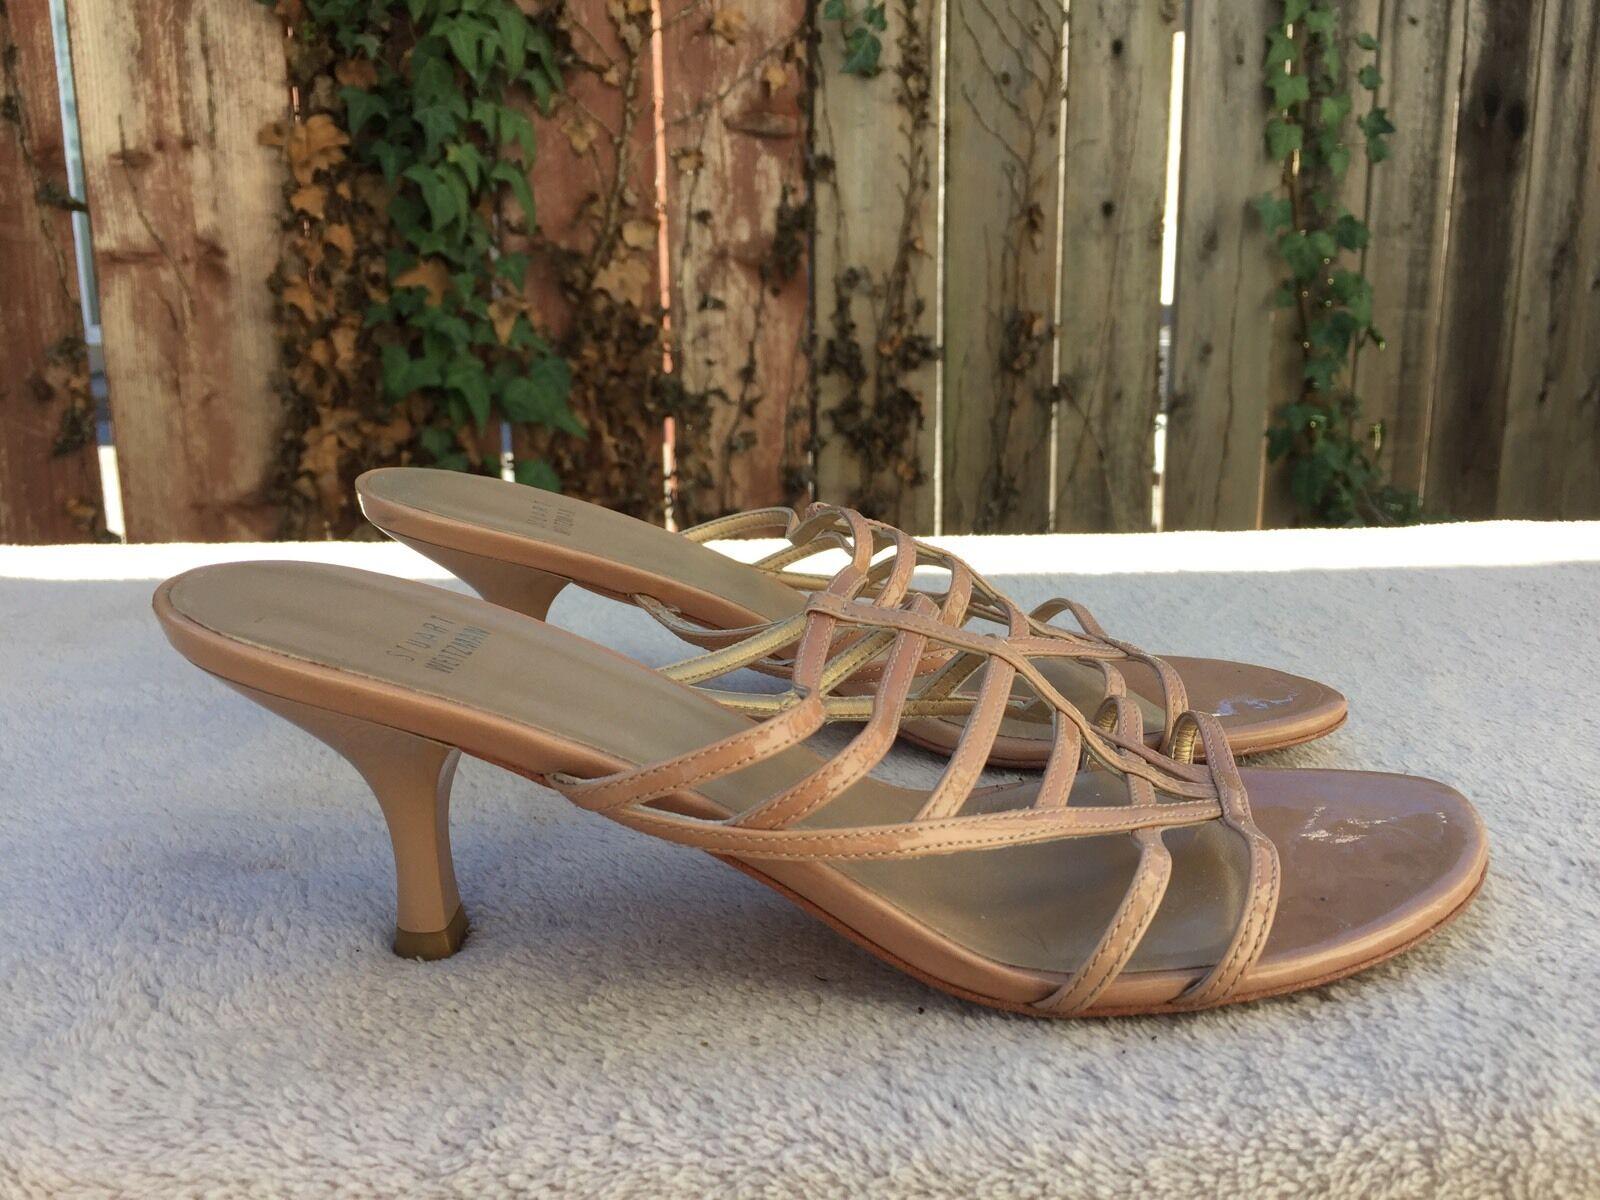 STUART WEITZMAN WEITZMAN WEITZMAN Medium Heel Sandals Beige Leather 8 1 2 933cc7